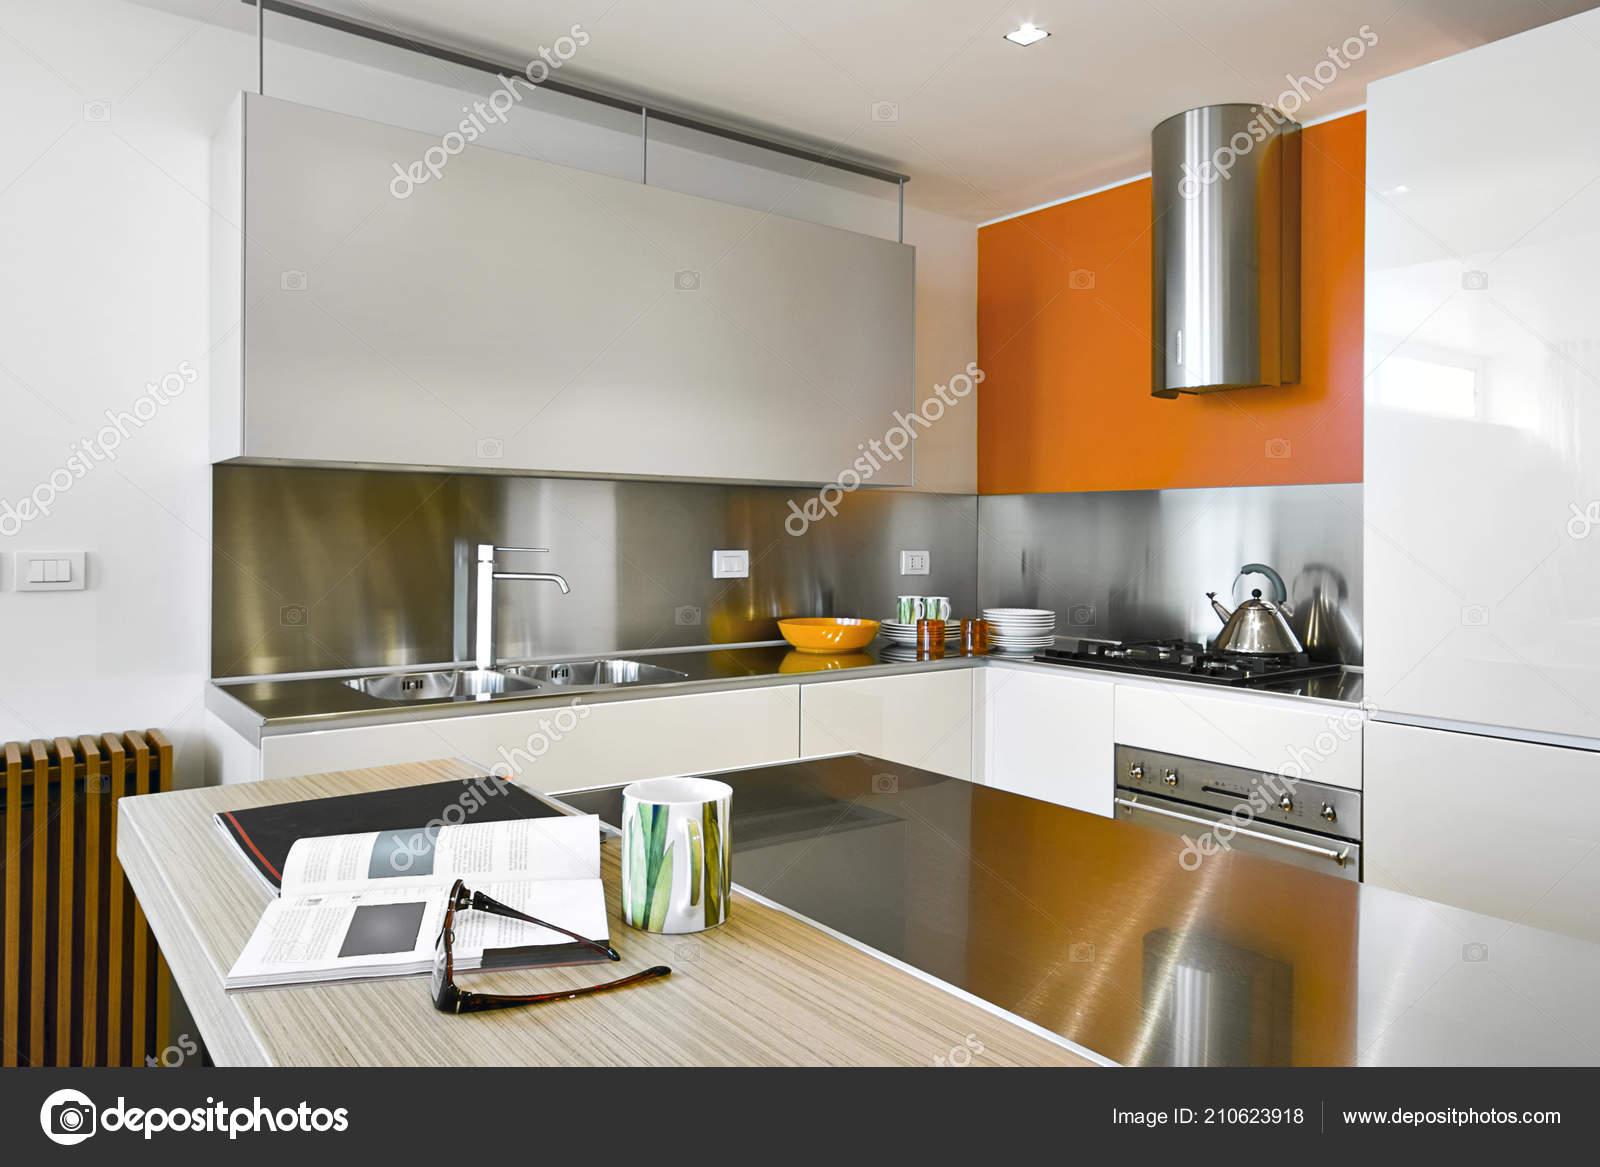 island kitchen hood and bath design software 现代厨房的内饰镜头与钢罩和厨房岛 图库照片 c aaphotograph 210623918